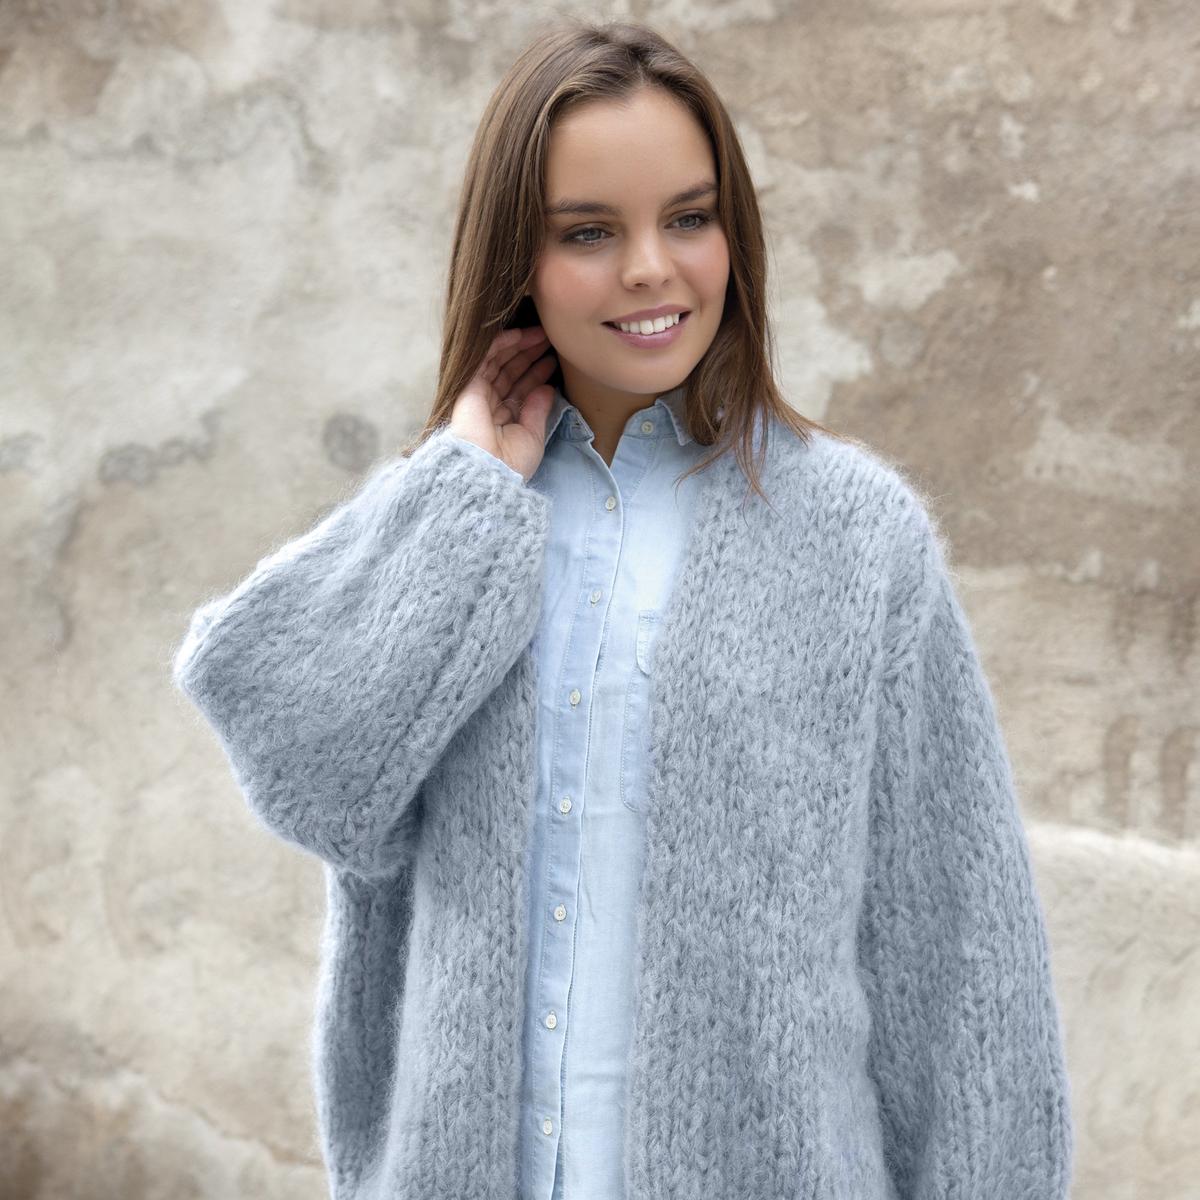 Knit an oversized cardigan